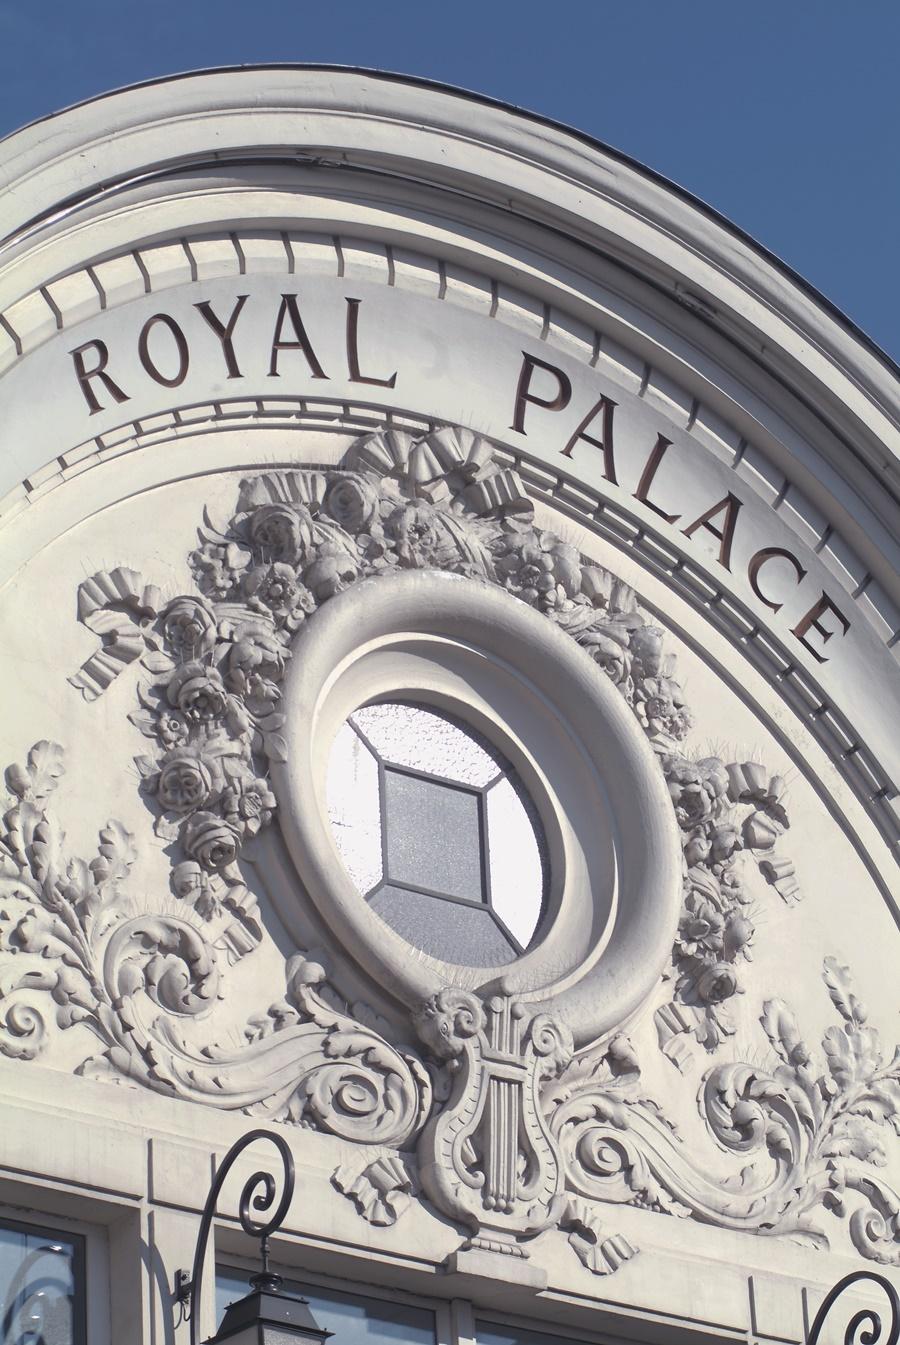 Cinema-royal-palace-2